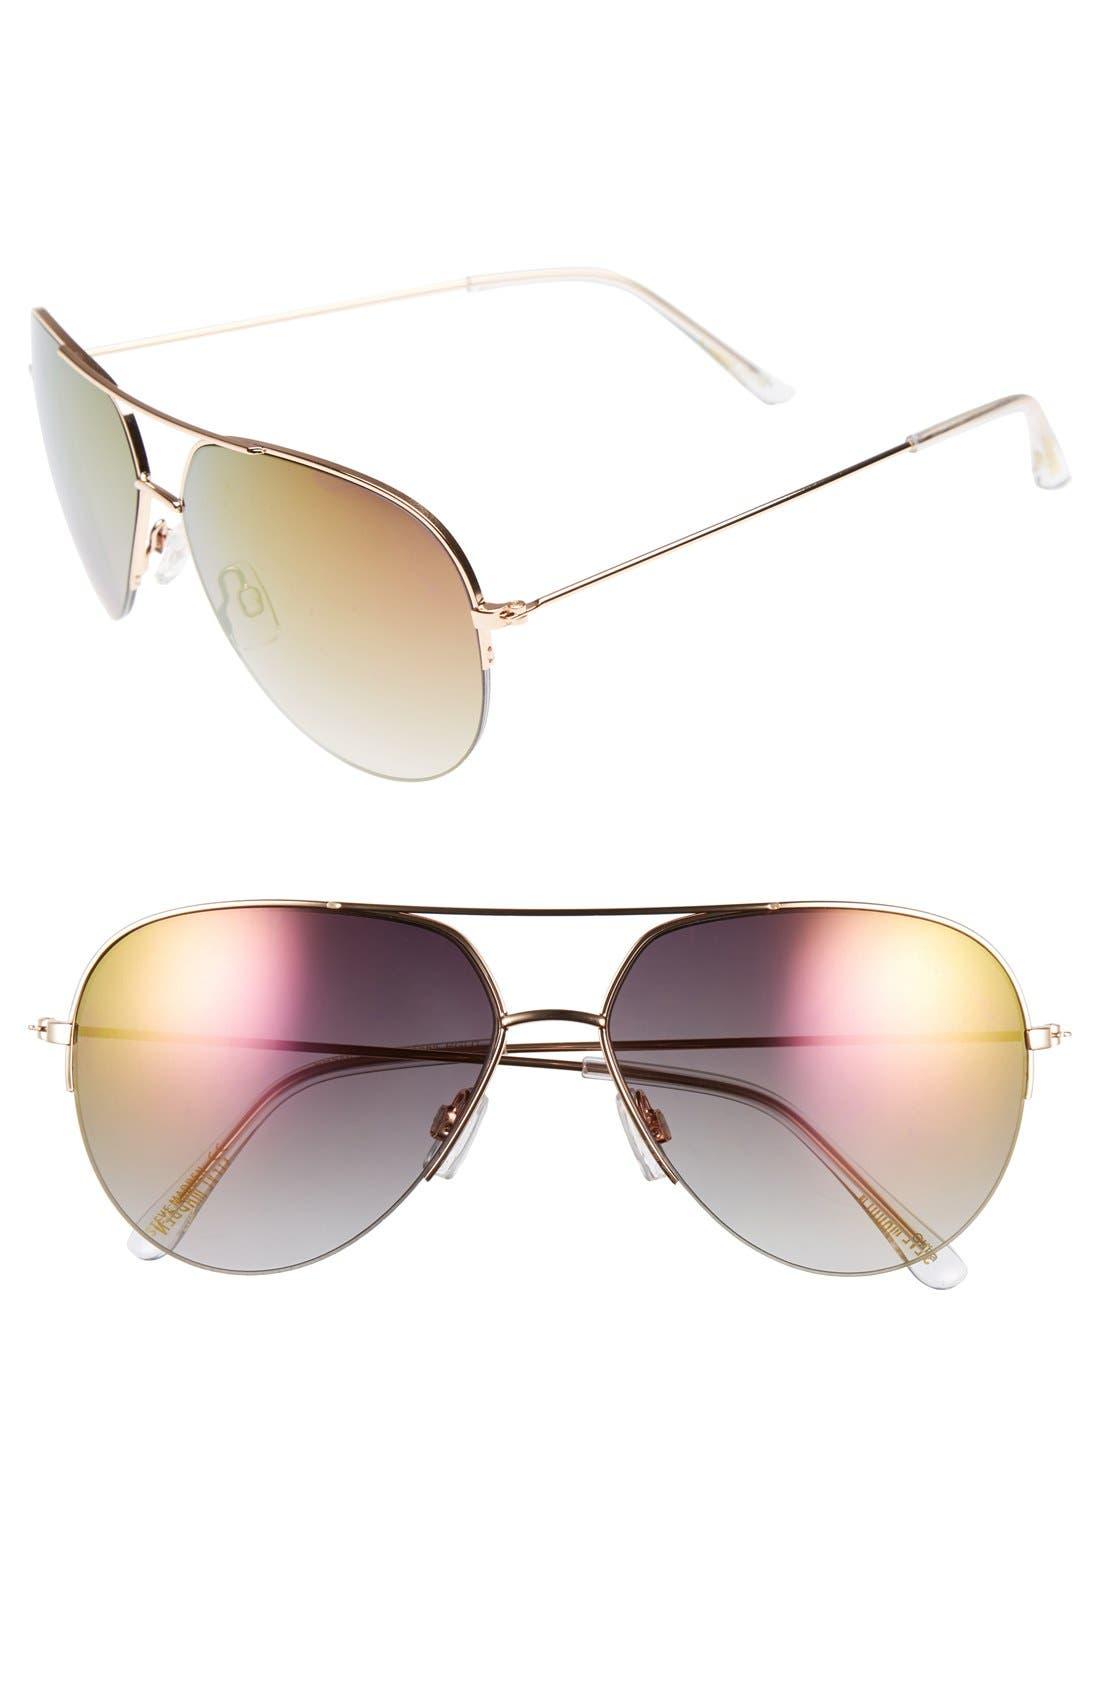 Alternate Image 1 Selected - Steve Madden Semi Rimless 60mm Mirrored Aviator Sunglasses